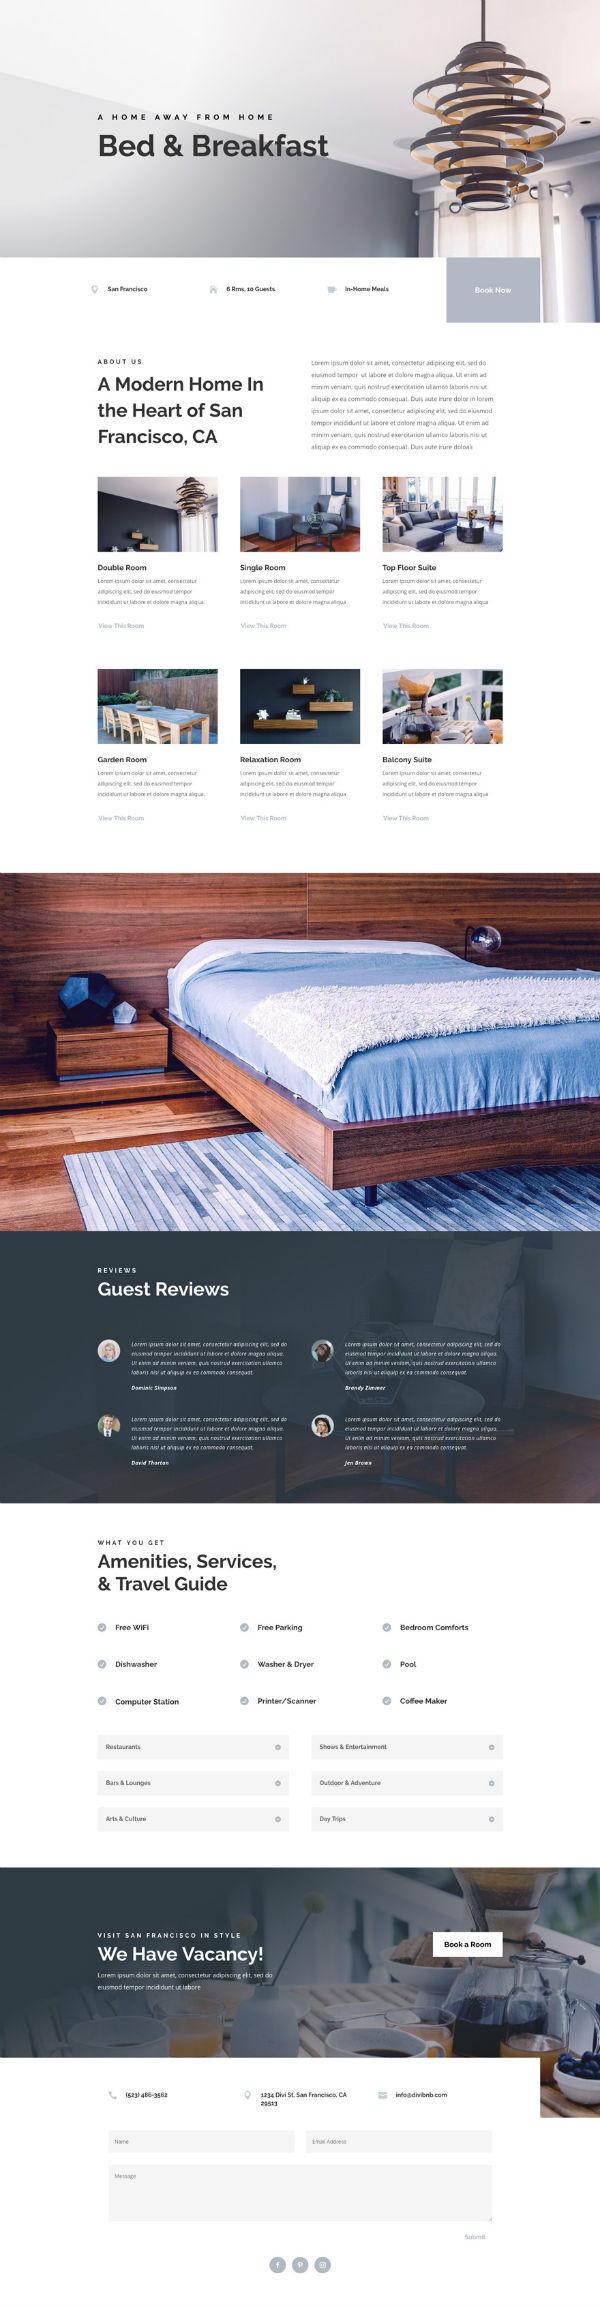 Bed and Breakfast Pre-made WordPress Website Design